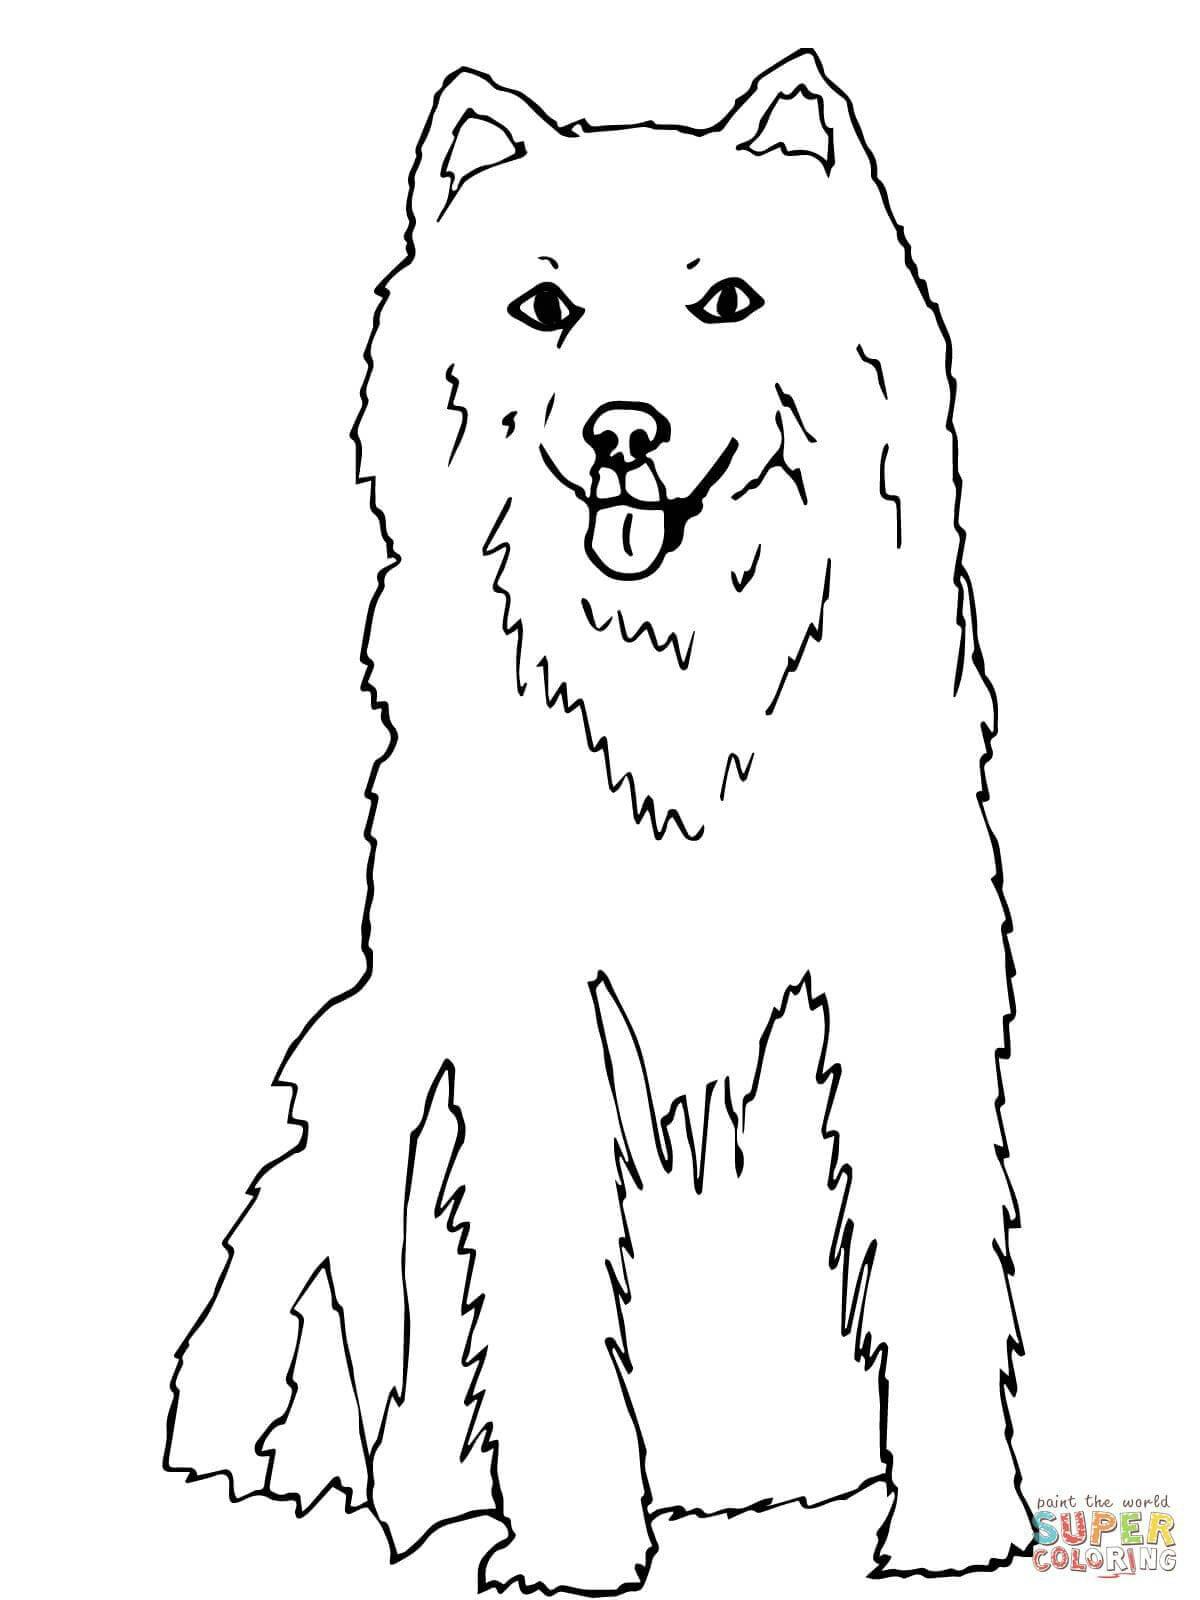 raskrasku-sobaki-napechatat раскраску собаки напечатать